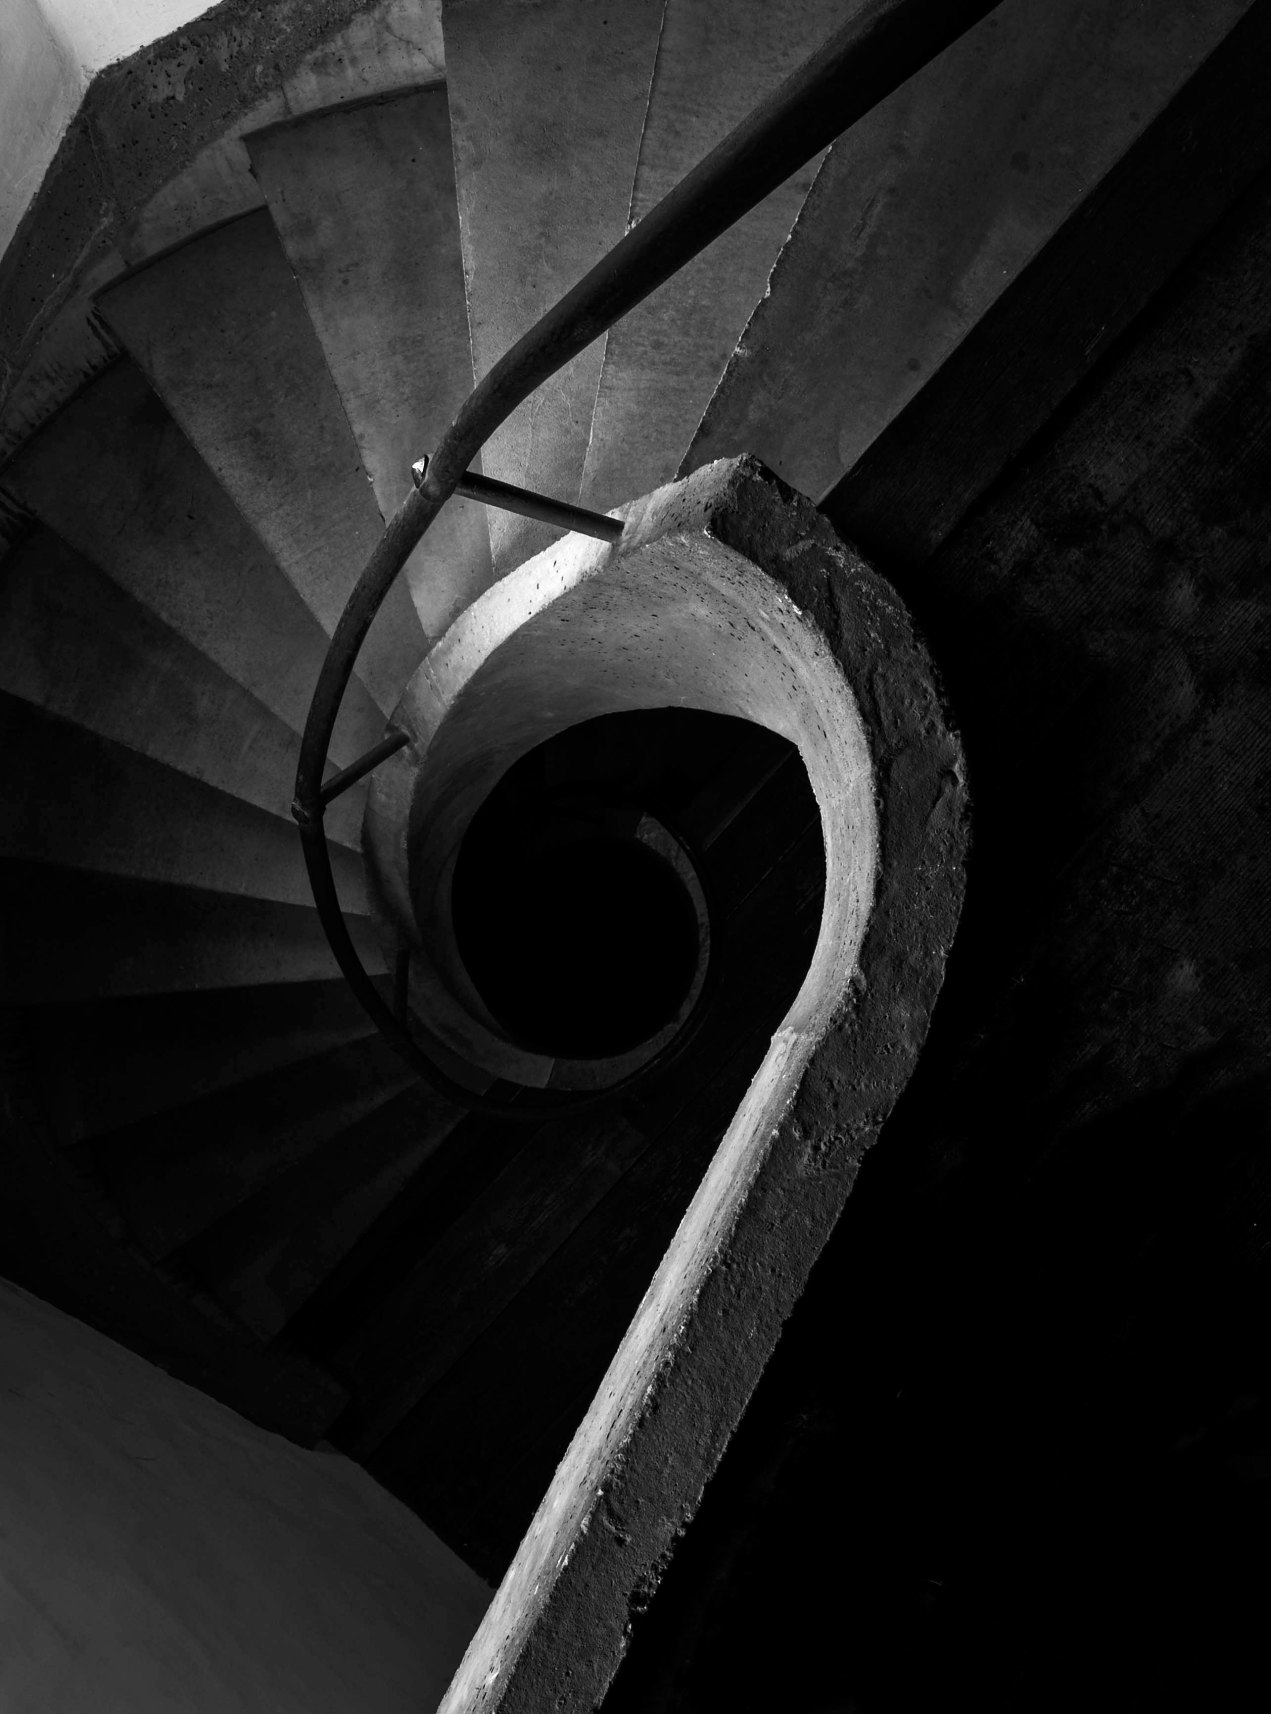 Escalier, Anvers, gildalliere, 2006